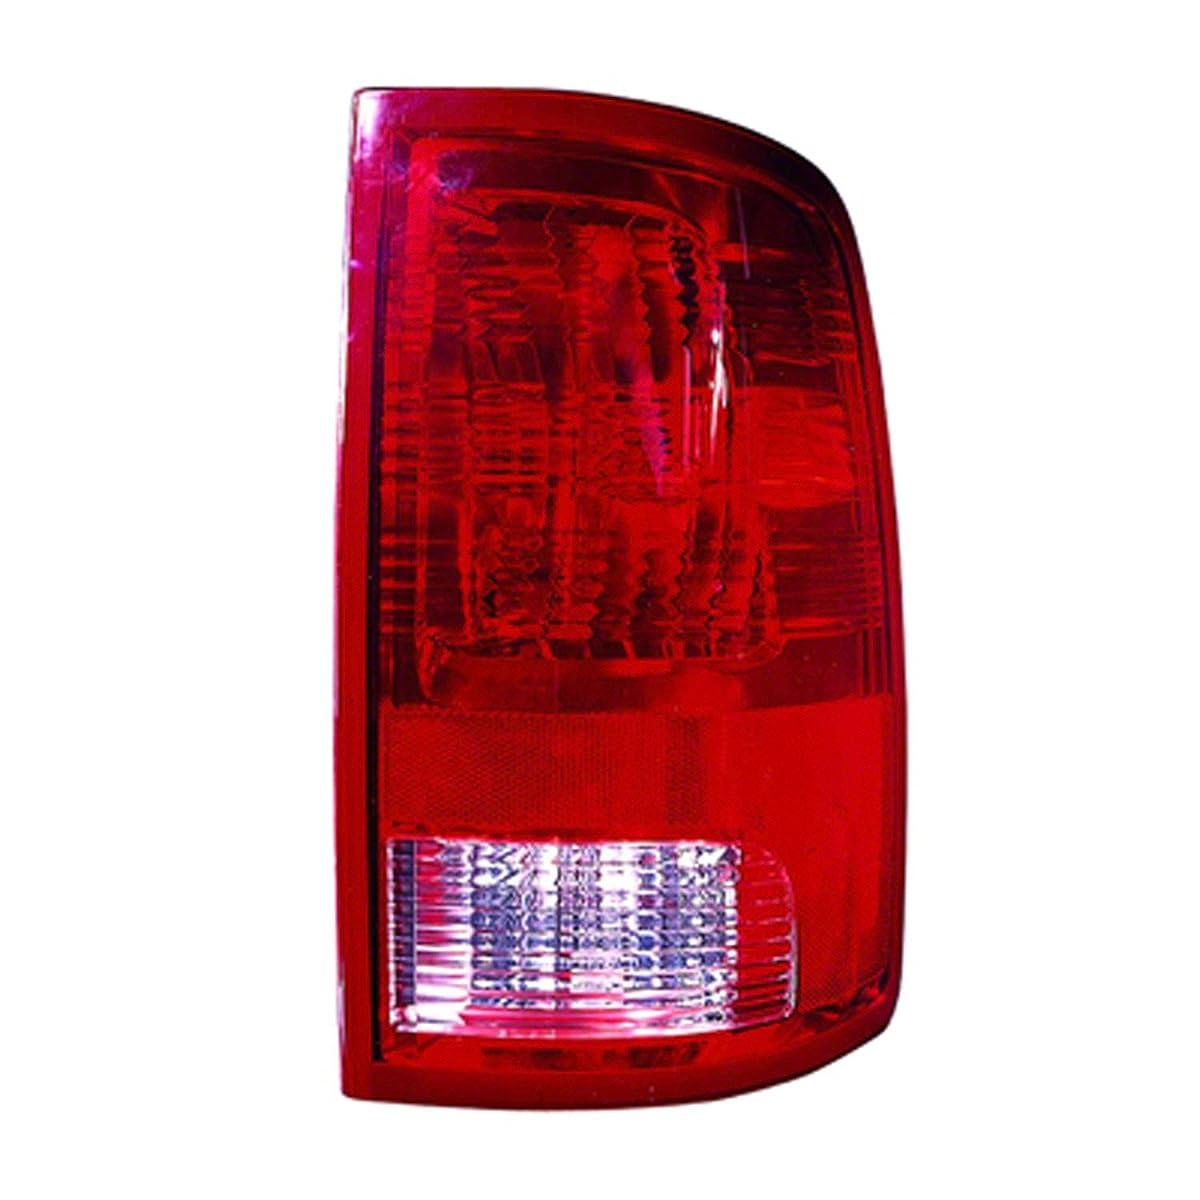 HEADLIGHTSDEPOT Tail Light Compatible with Ram 1500 2500 3500 Right Passenger Side Tail Light